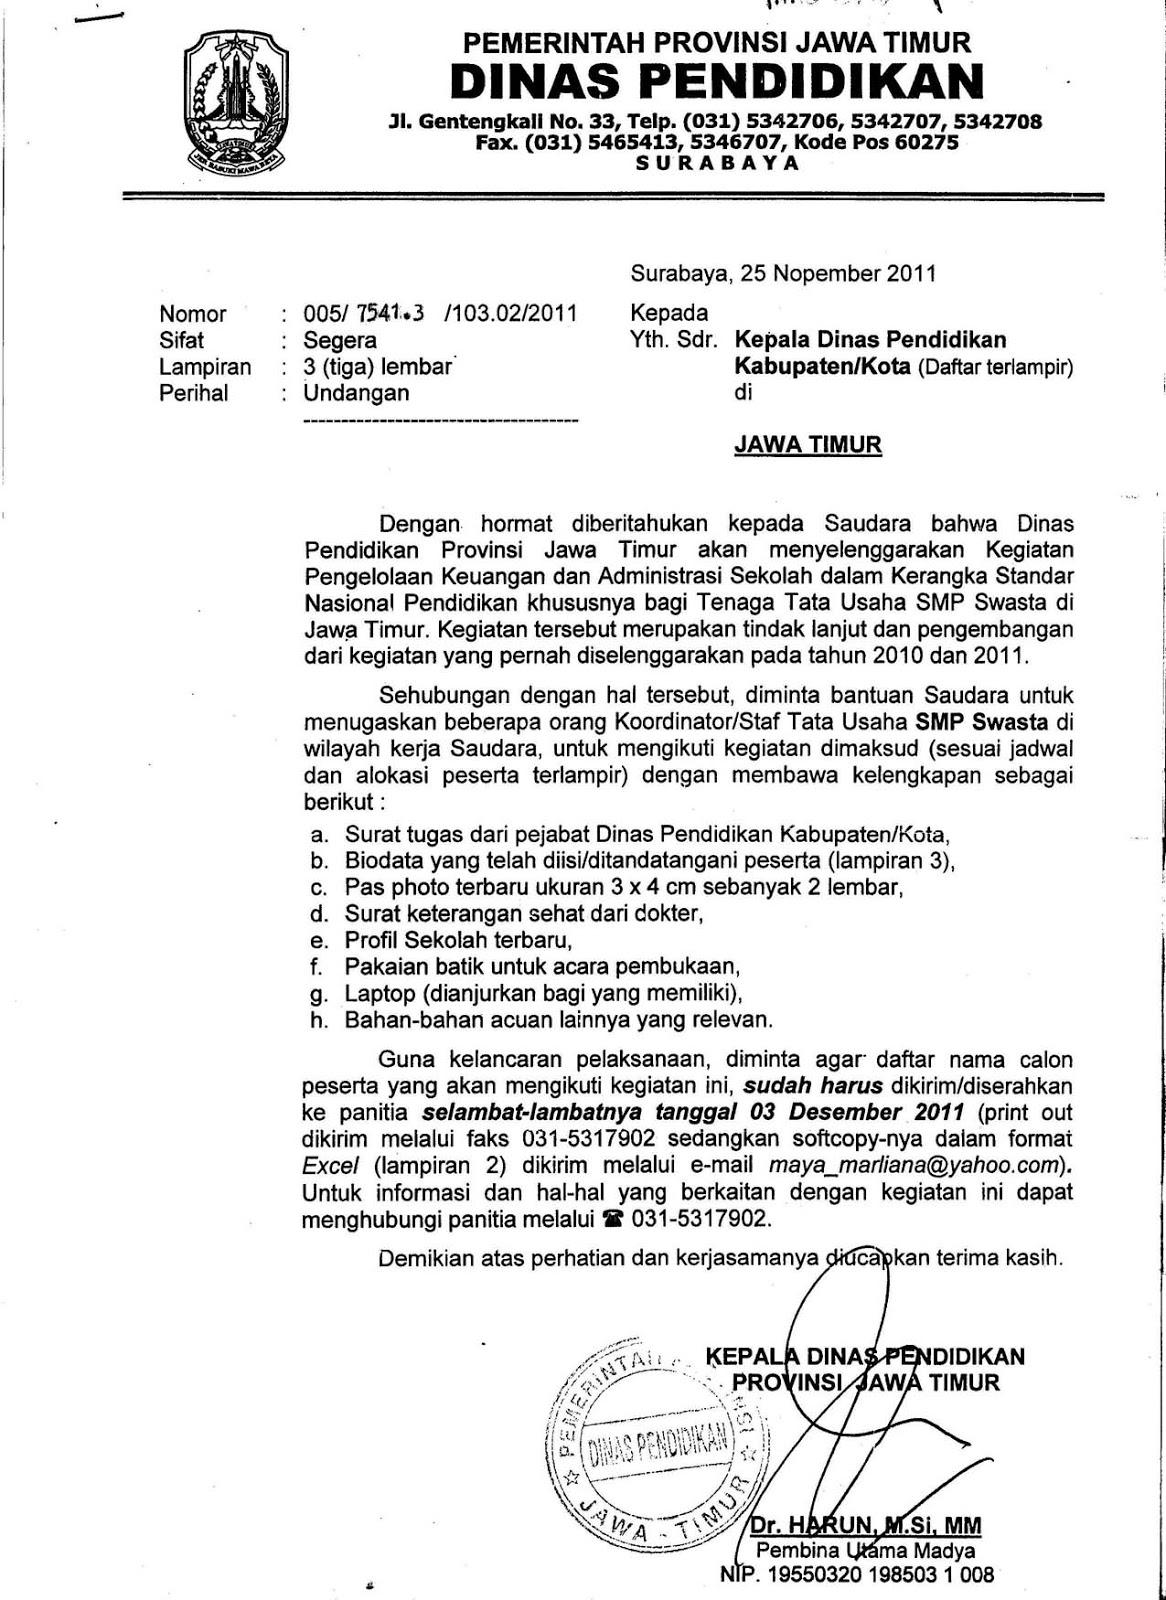 Adm Perkantoran Setunggal Penggolongan Surat